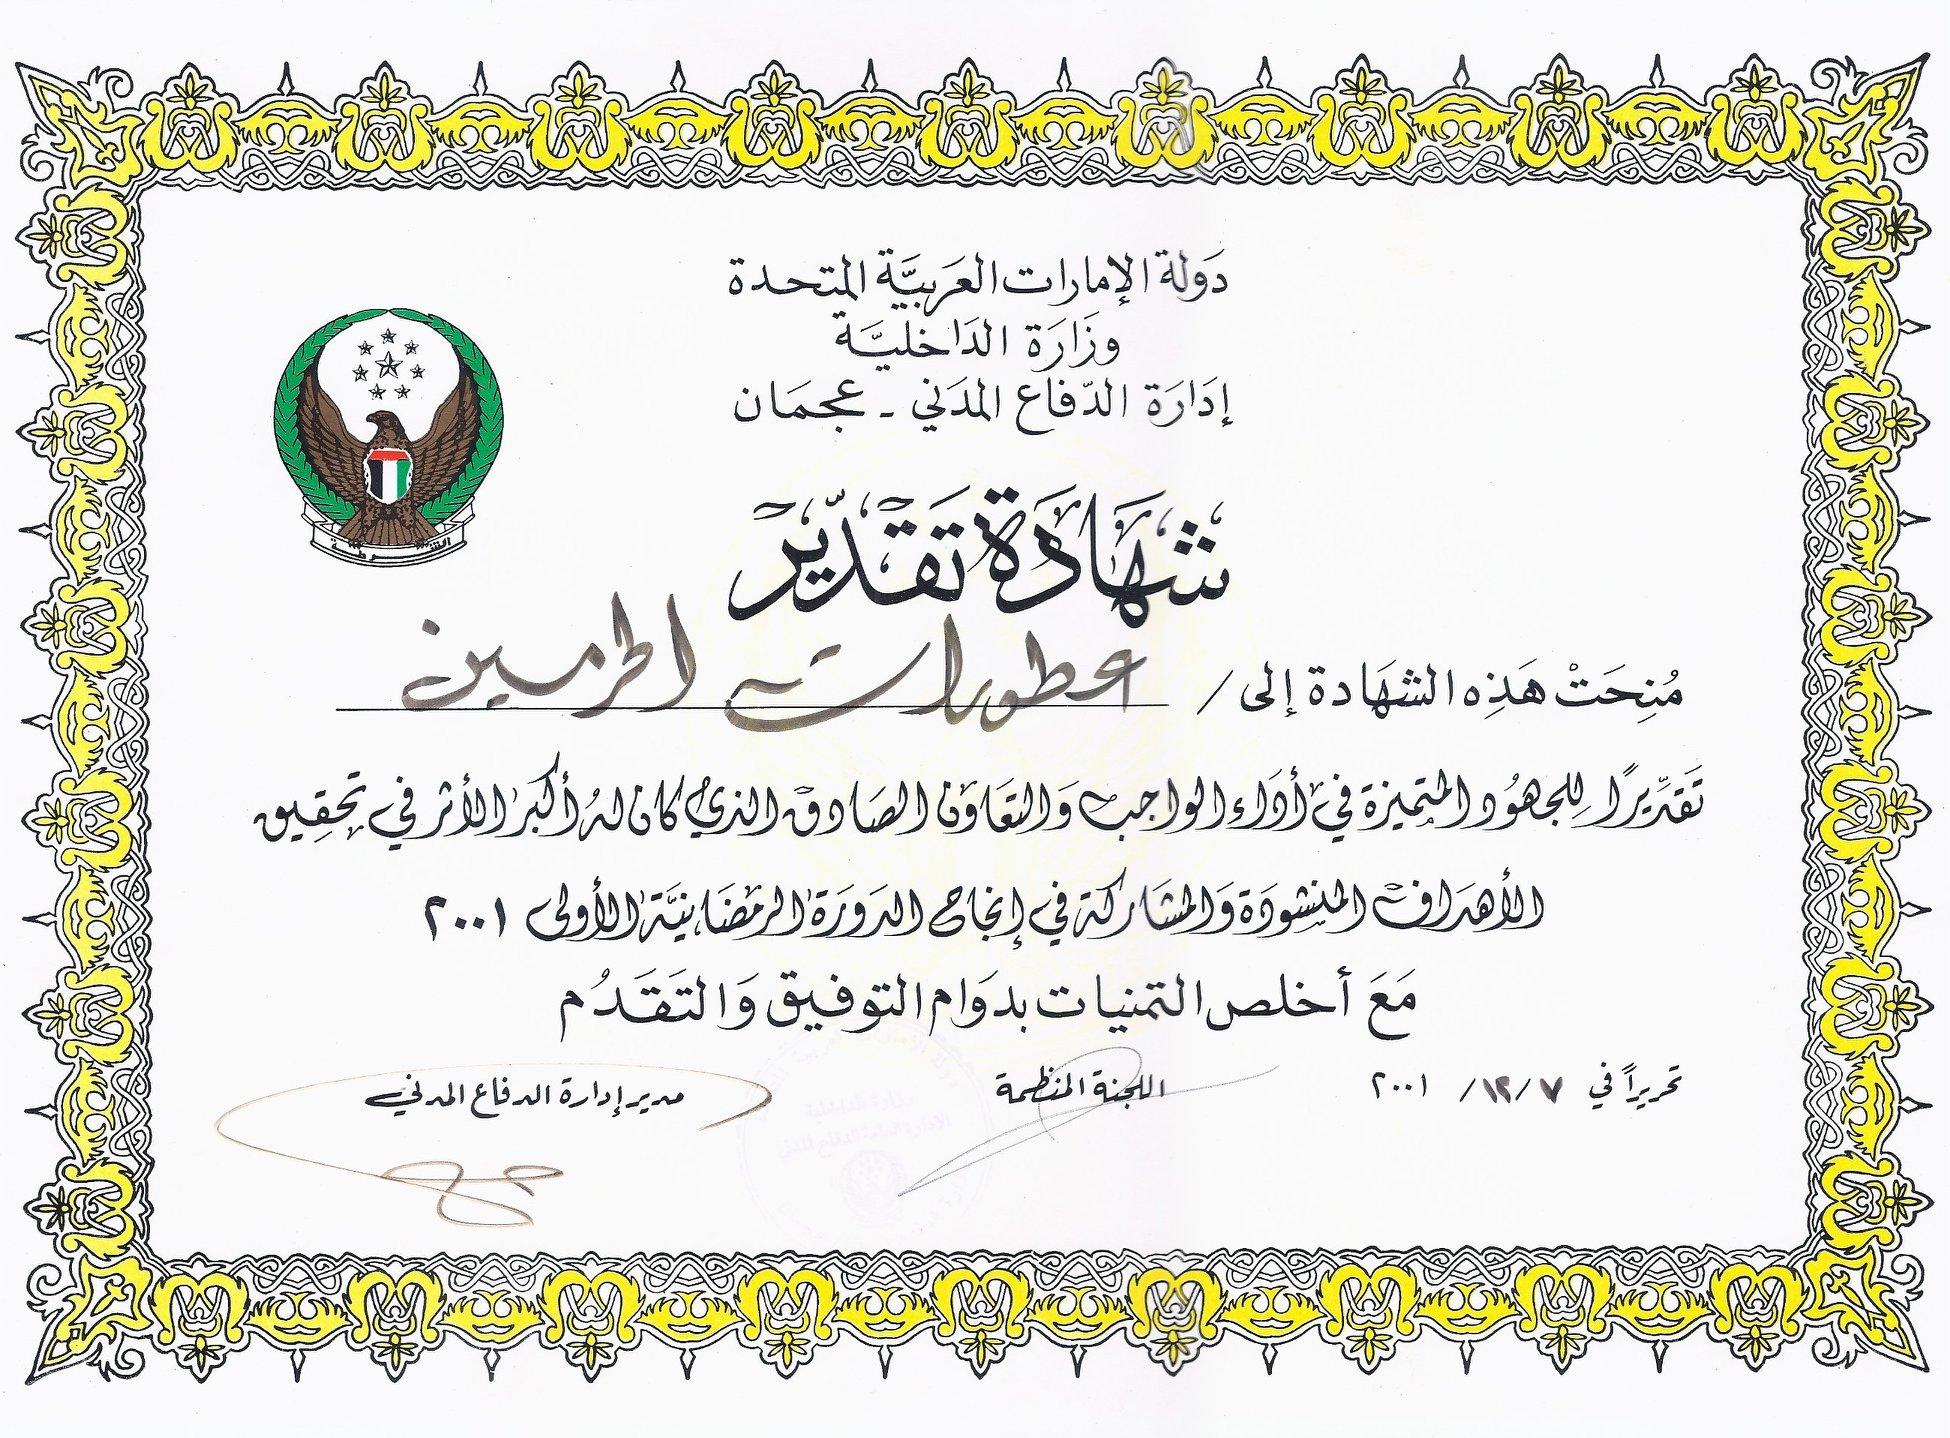 department of civil defence 2001 ramadan session award to al haramain perfumes